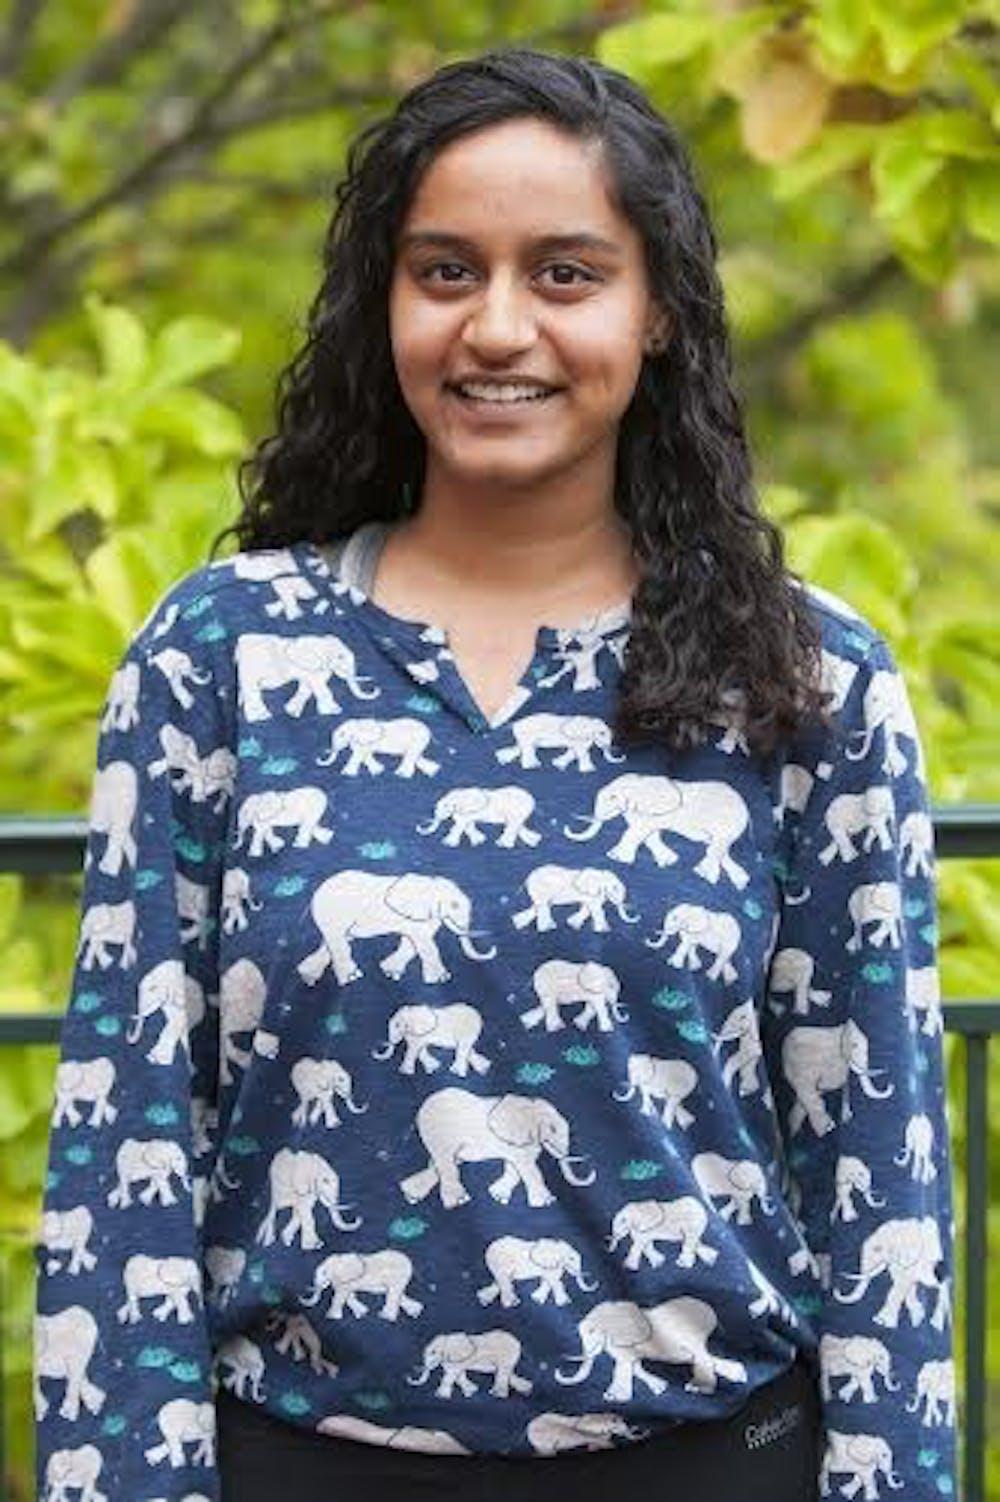 <p>Vega's column runs biweekly Tuesdays. She can be reached at v.bharadwaj@cavalierdaily.com.</p>